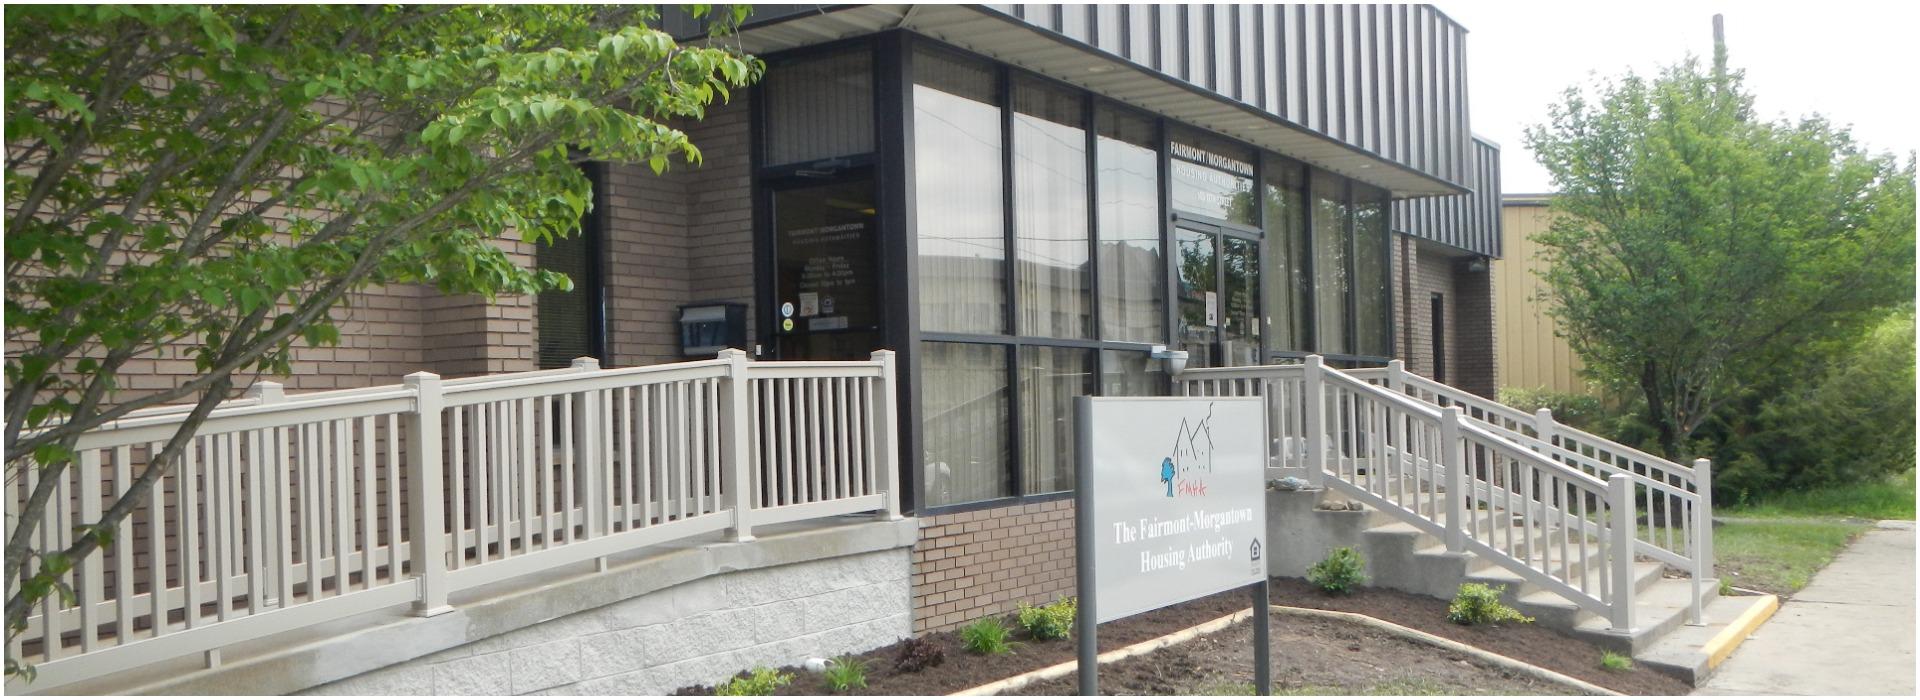 Welcome to Fairmont-Morgantown Housing Authority